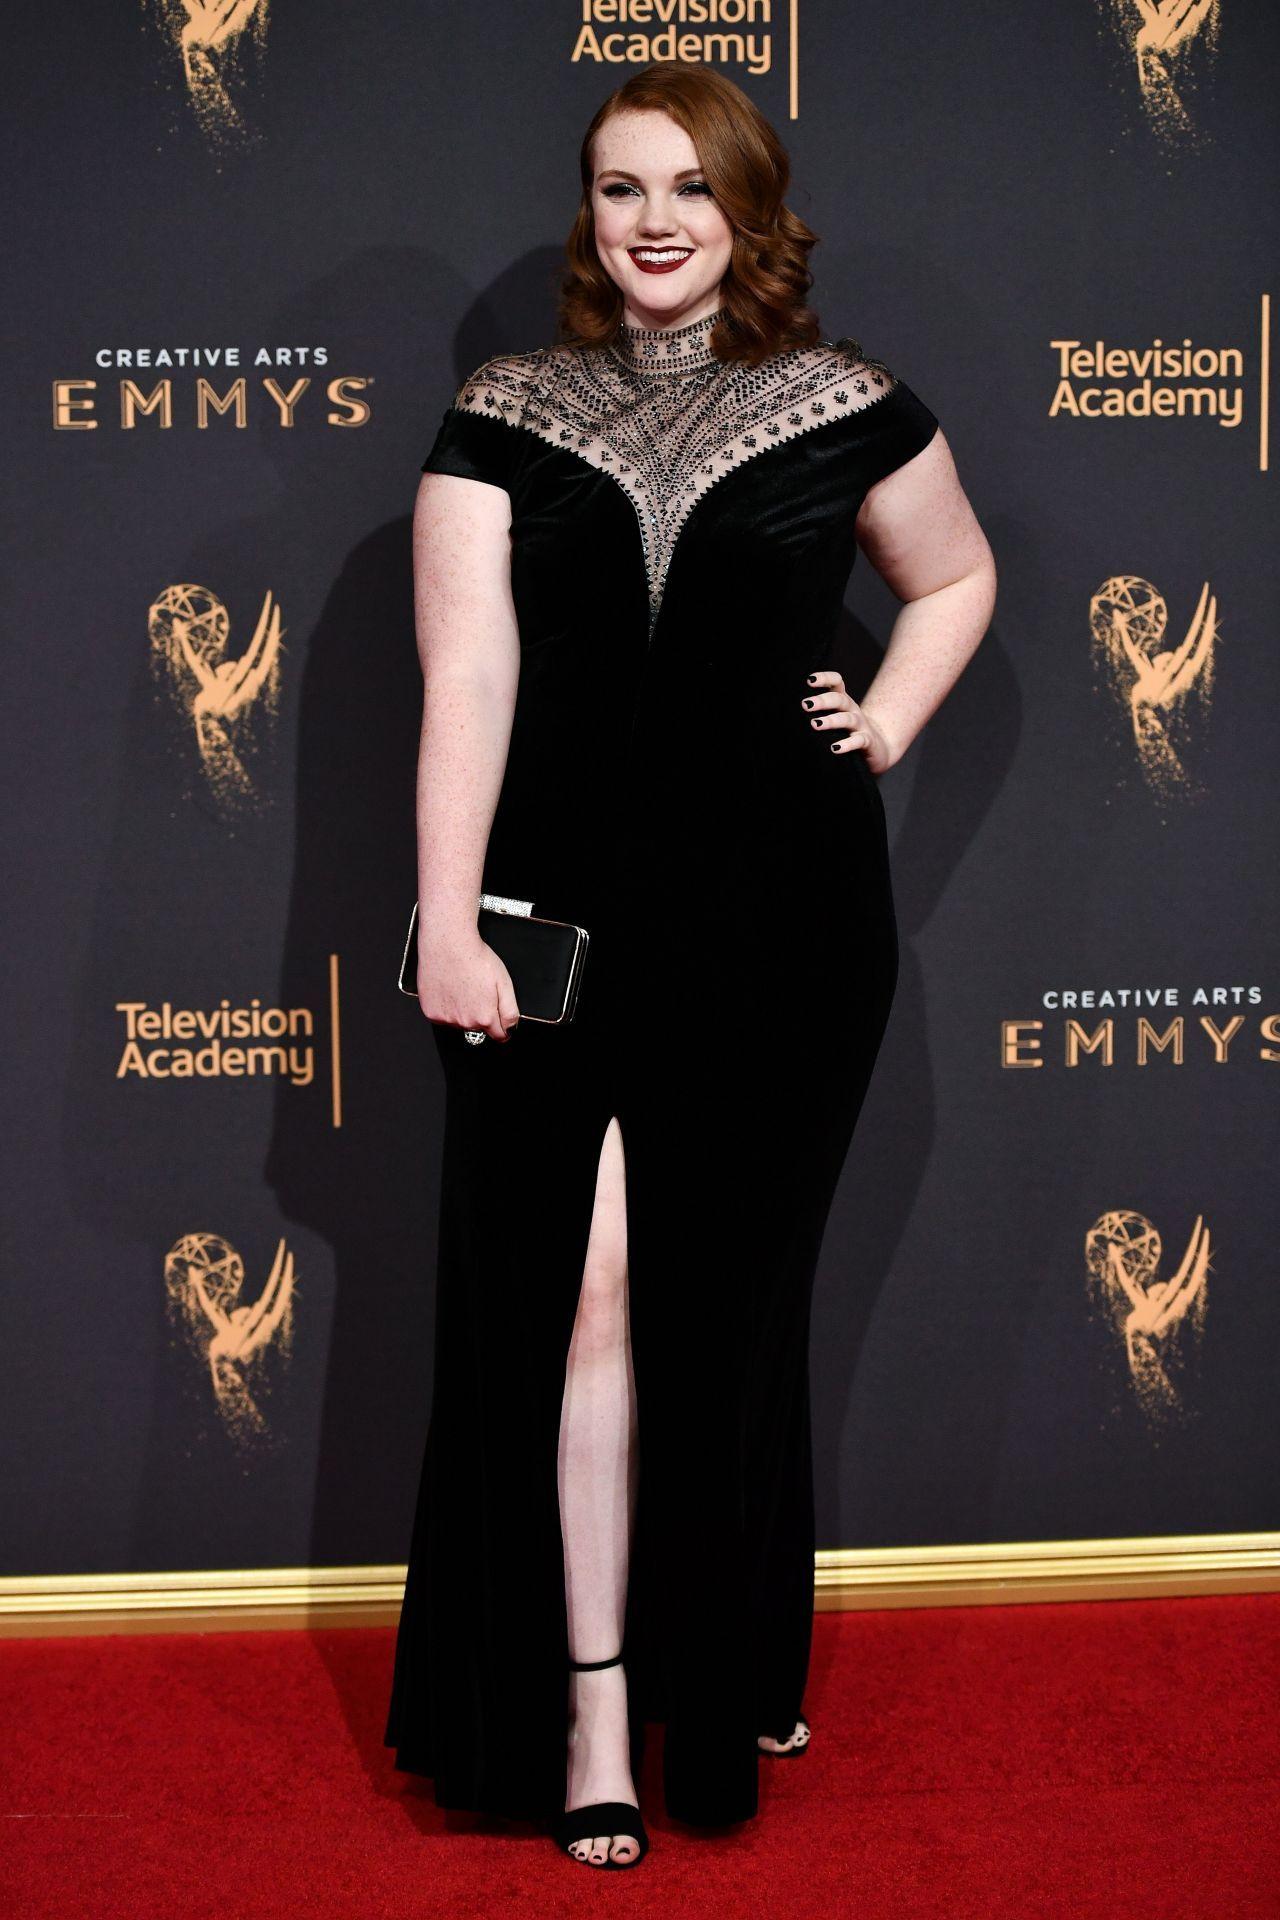 b47e0c0622d Shannon Purser in Tadashi Shoji at the 2017 Creative Arts Emmy Awards  2017   Emmys  Awards  BestDressed